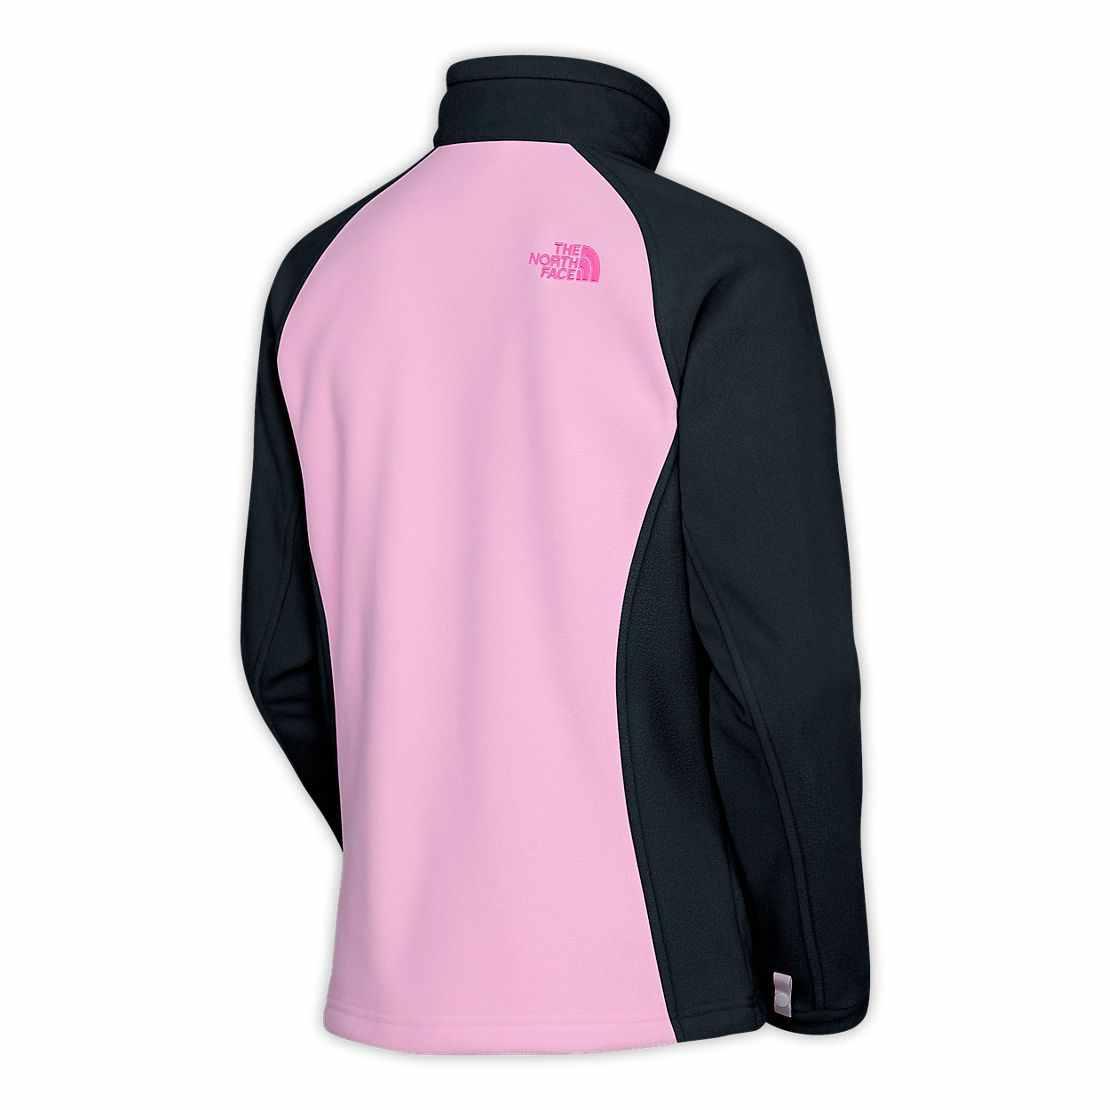 North-Face-PINK-RIBBON-KHUMBU-JACKET-Pink-Black-WOMENS How Women Choose Fleece Jackets